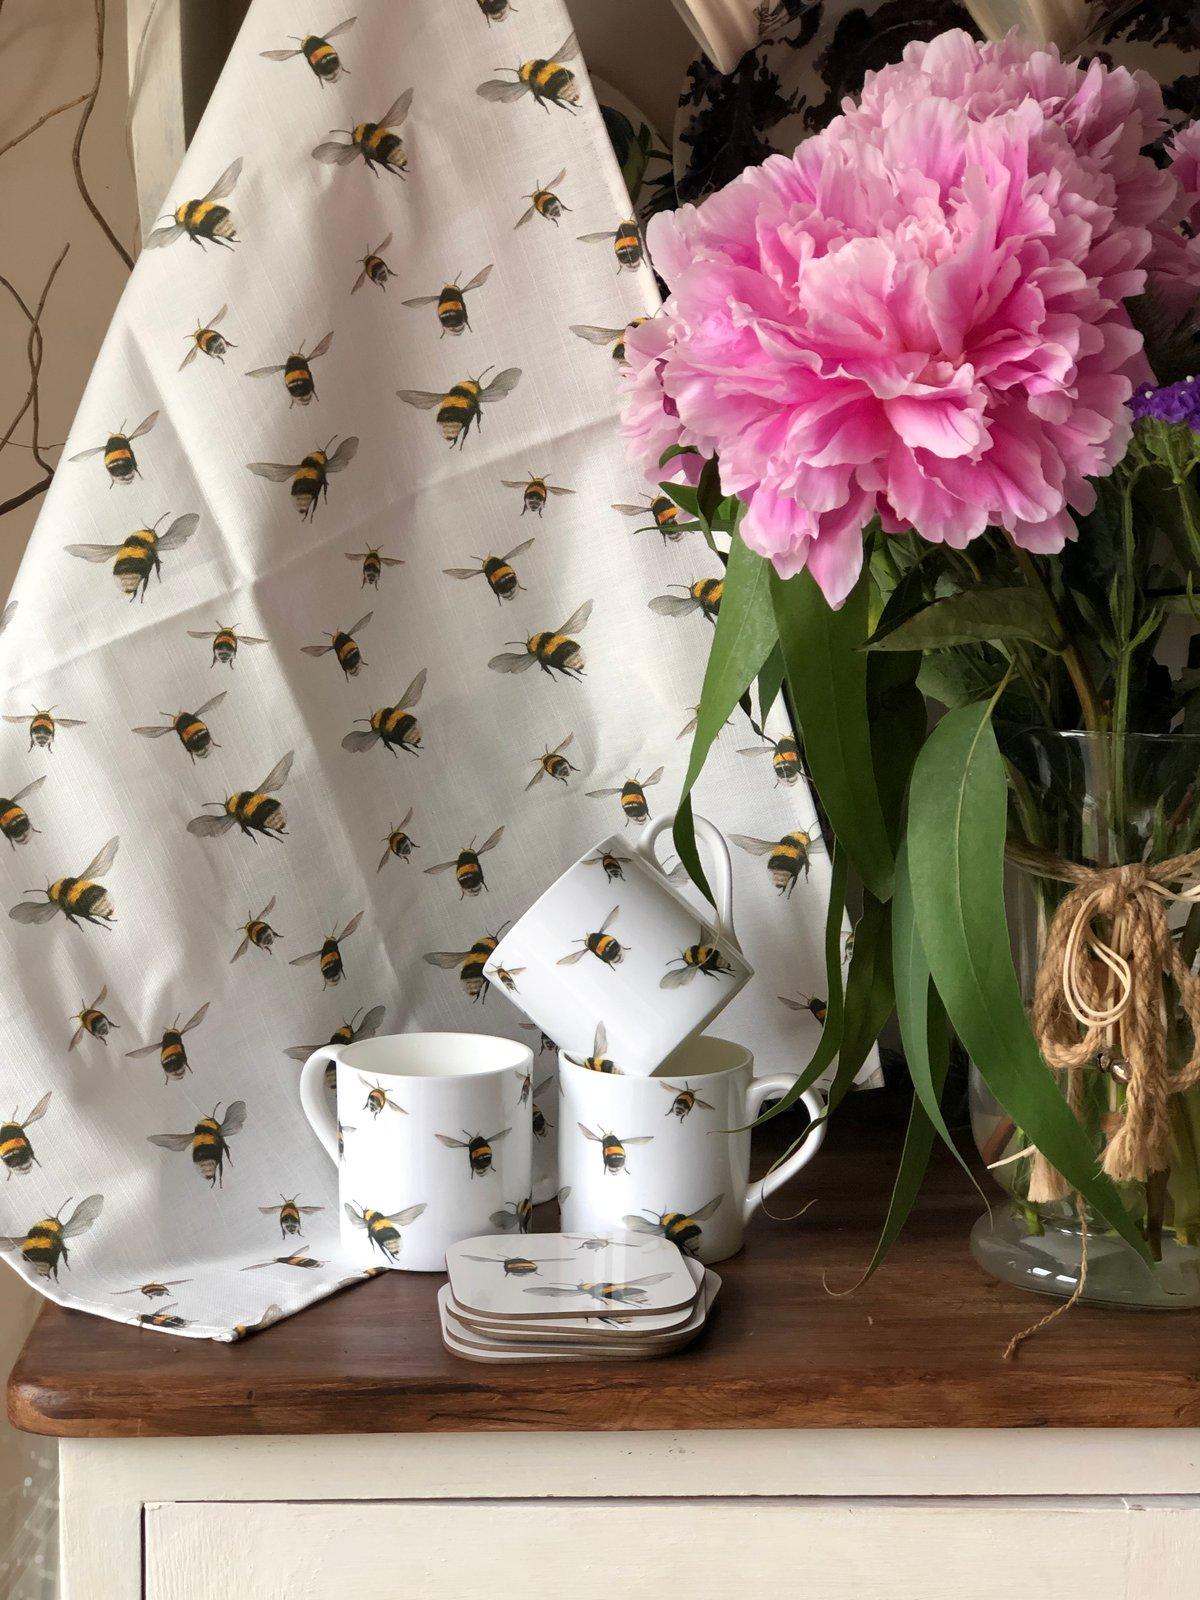 Image of 'Bumblebee' Tea towel